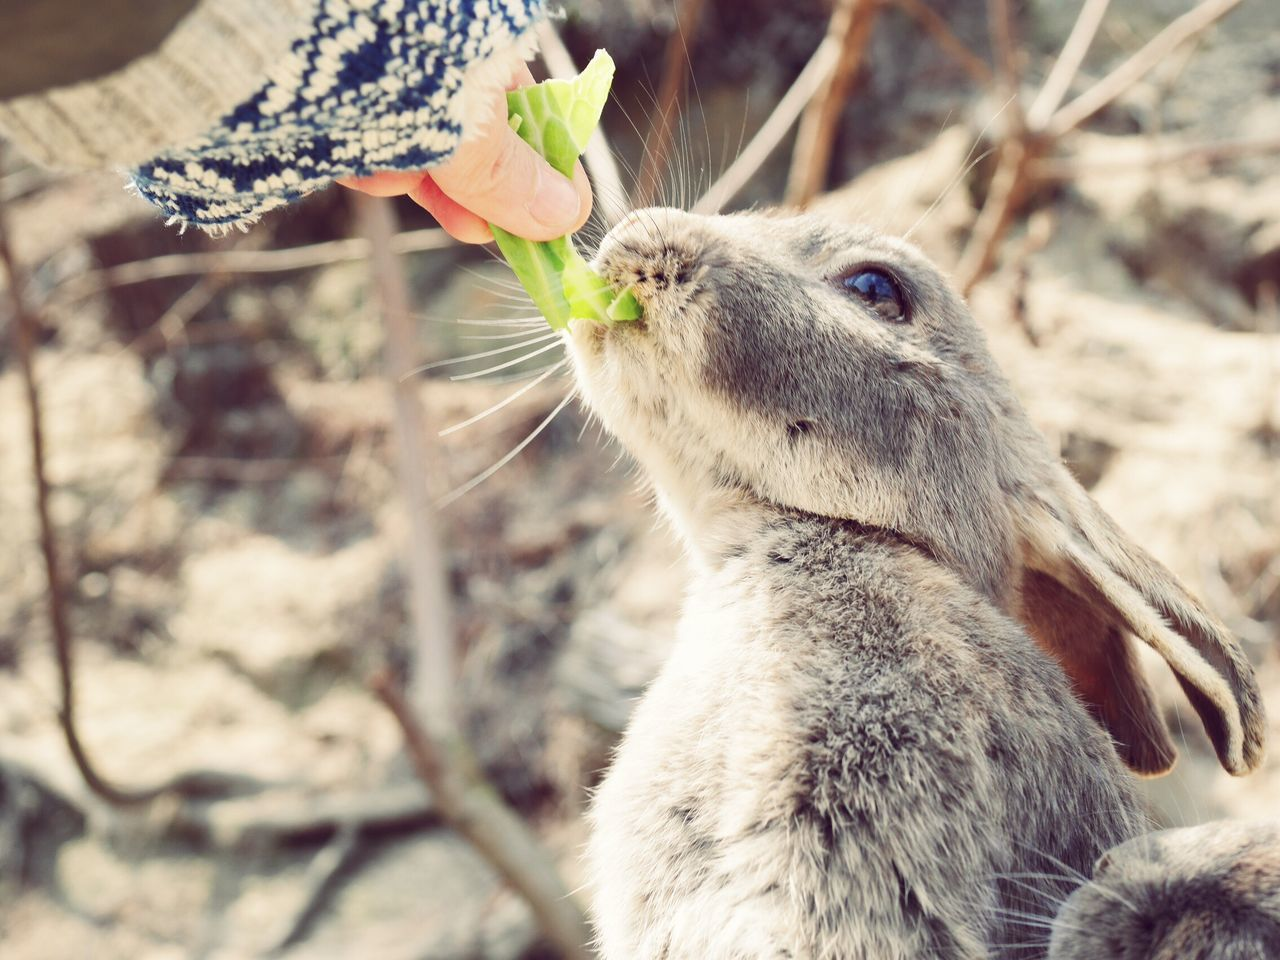 Beautiful Nature Beautiful Nature_collection Pretty Nature Japanese  Outdoors Cute Nature Photography Animal Photography Island Animal Wildlife Animals Animal Animals In The Wild Rabbit ❤️ Rabbits Rabbit Animal Themes